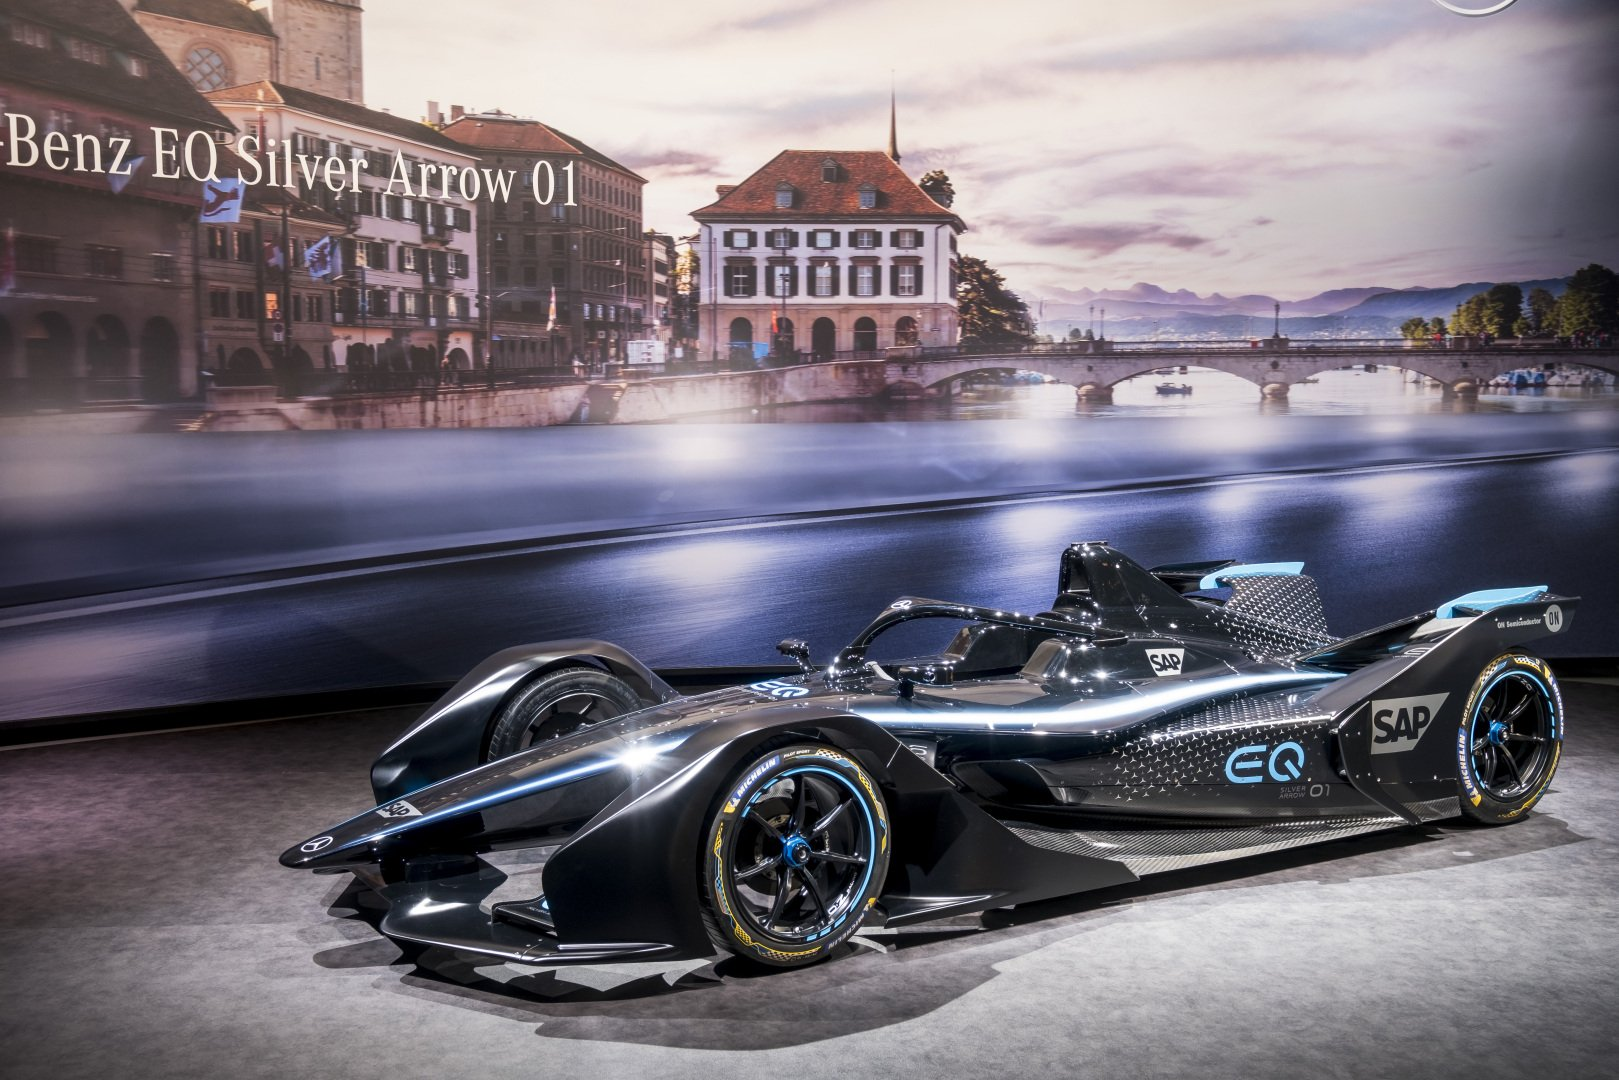 The Mercedes‐Benz EQ Silver Arrow 01